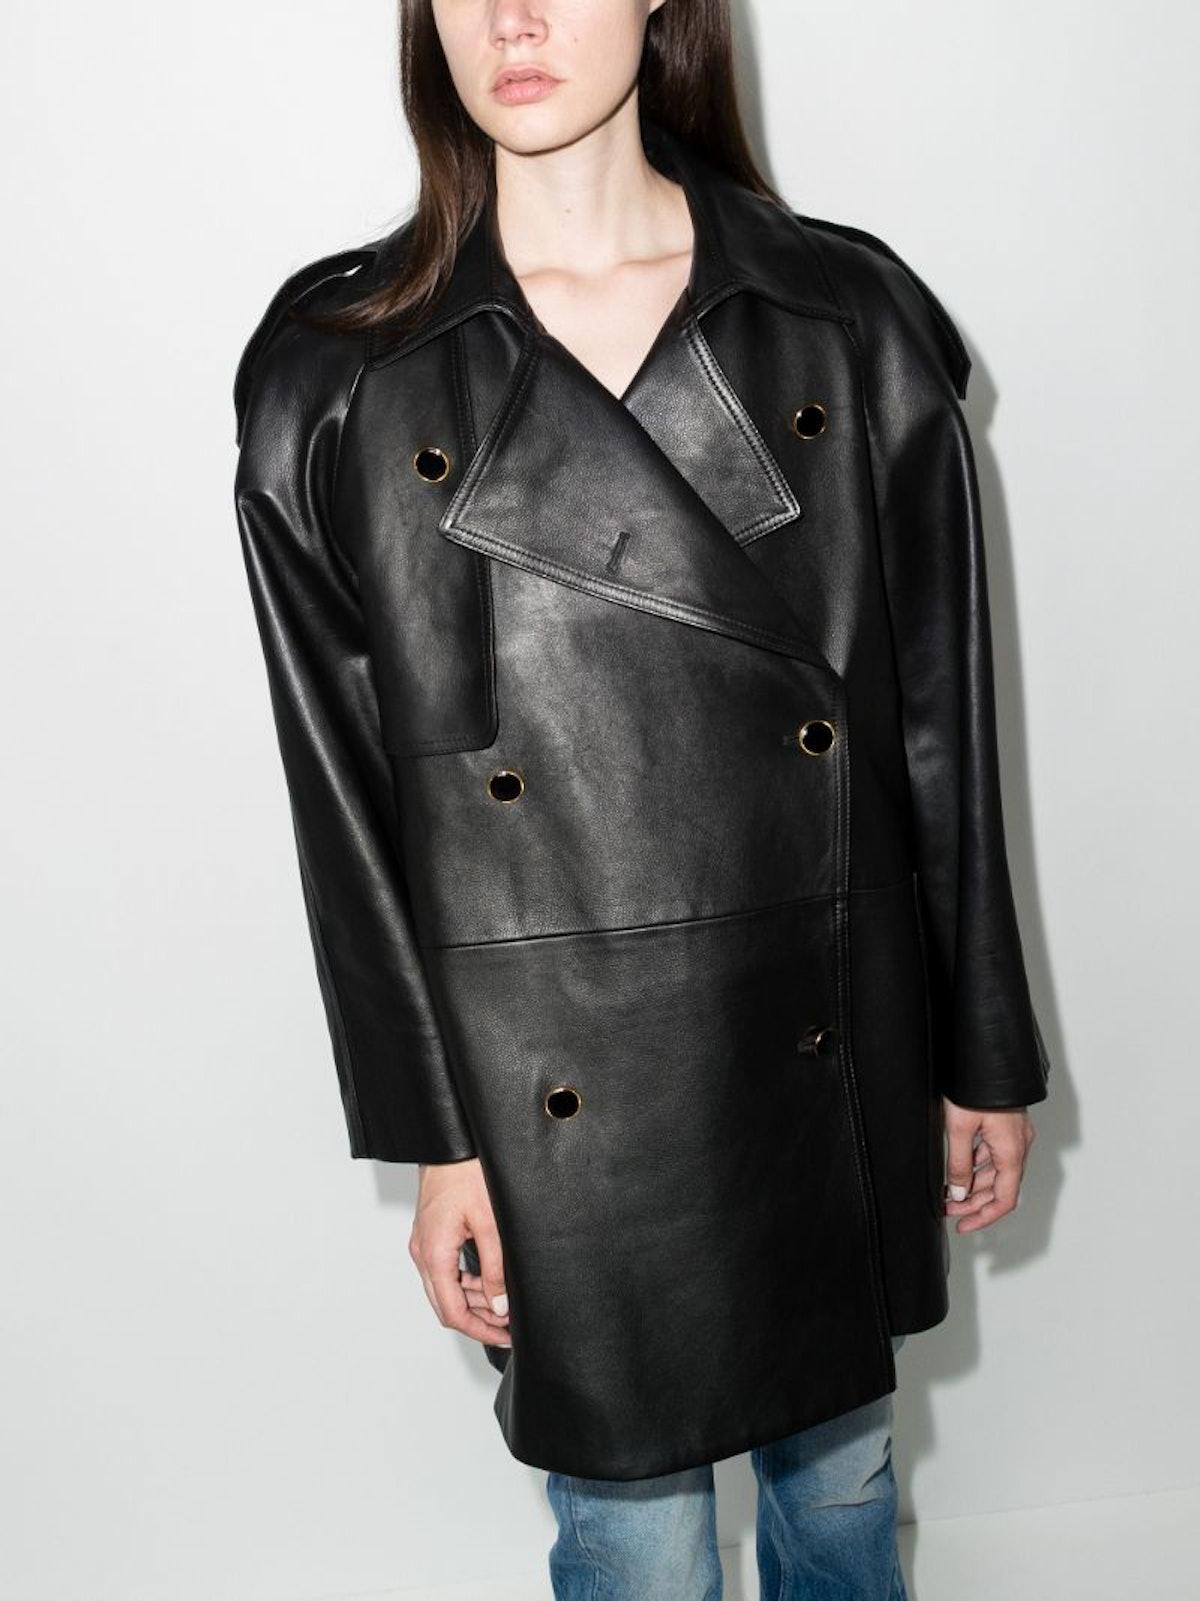 Eden Leather Trench Coat